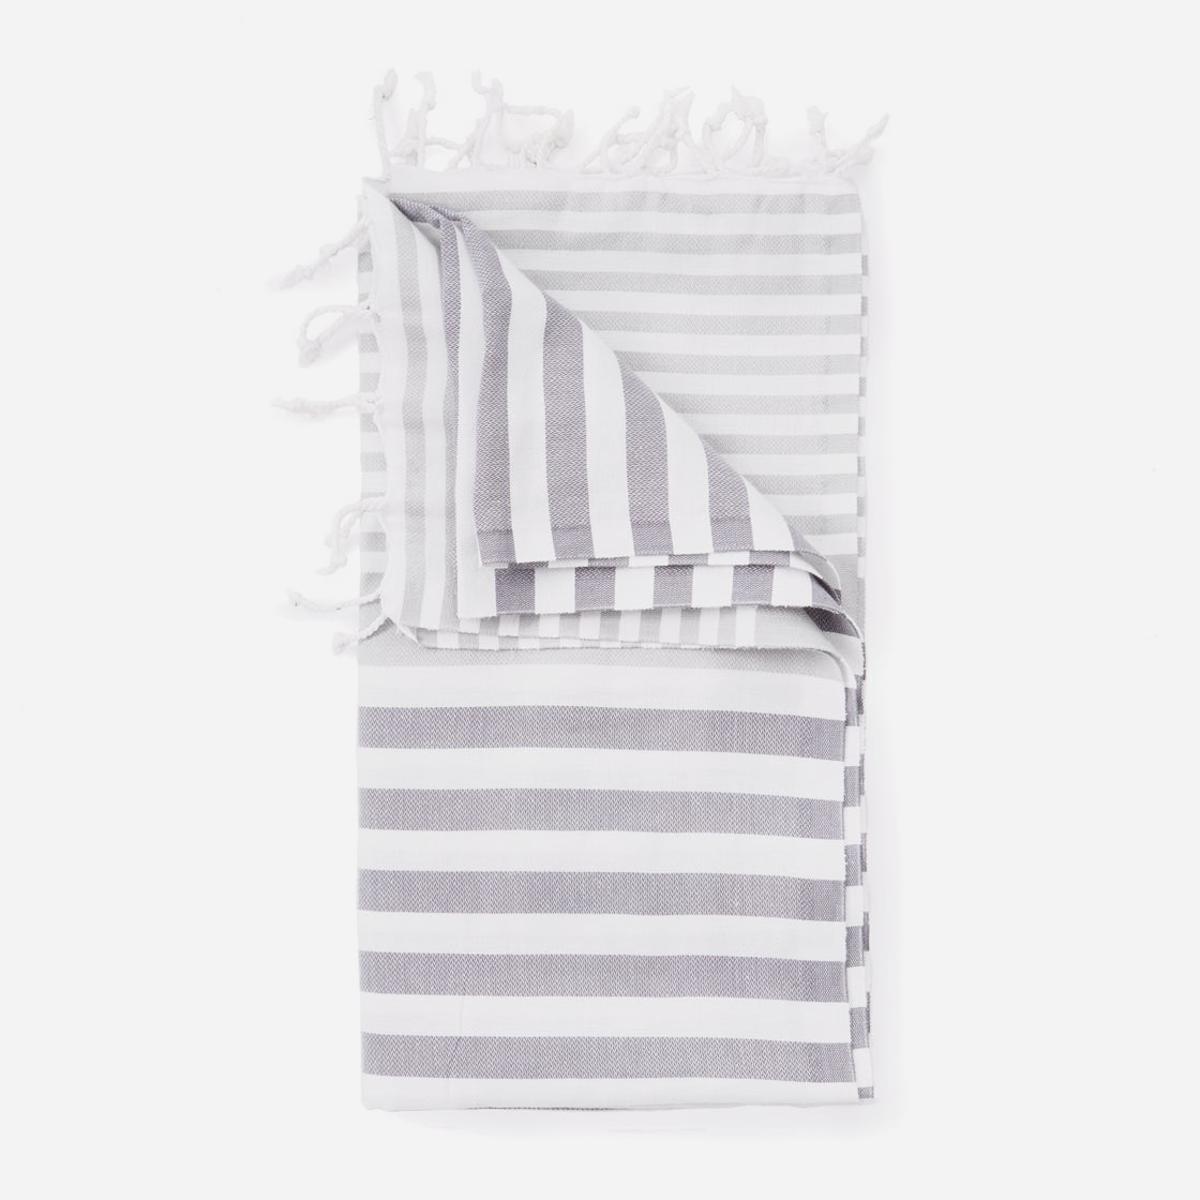 Turkish Towels